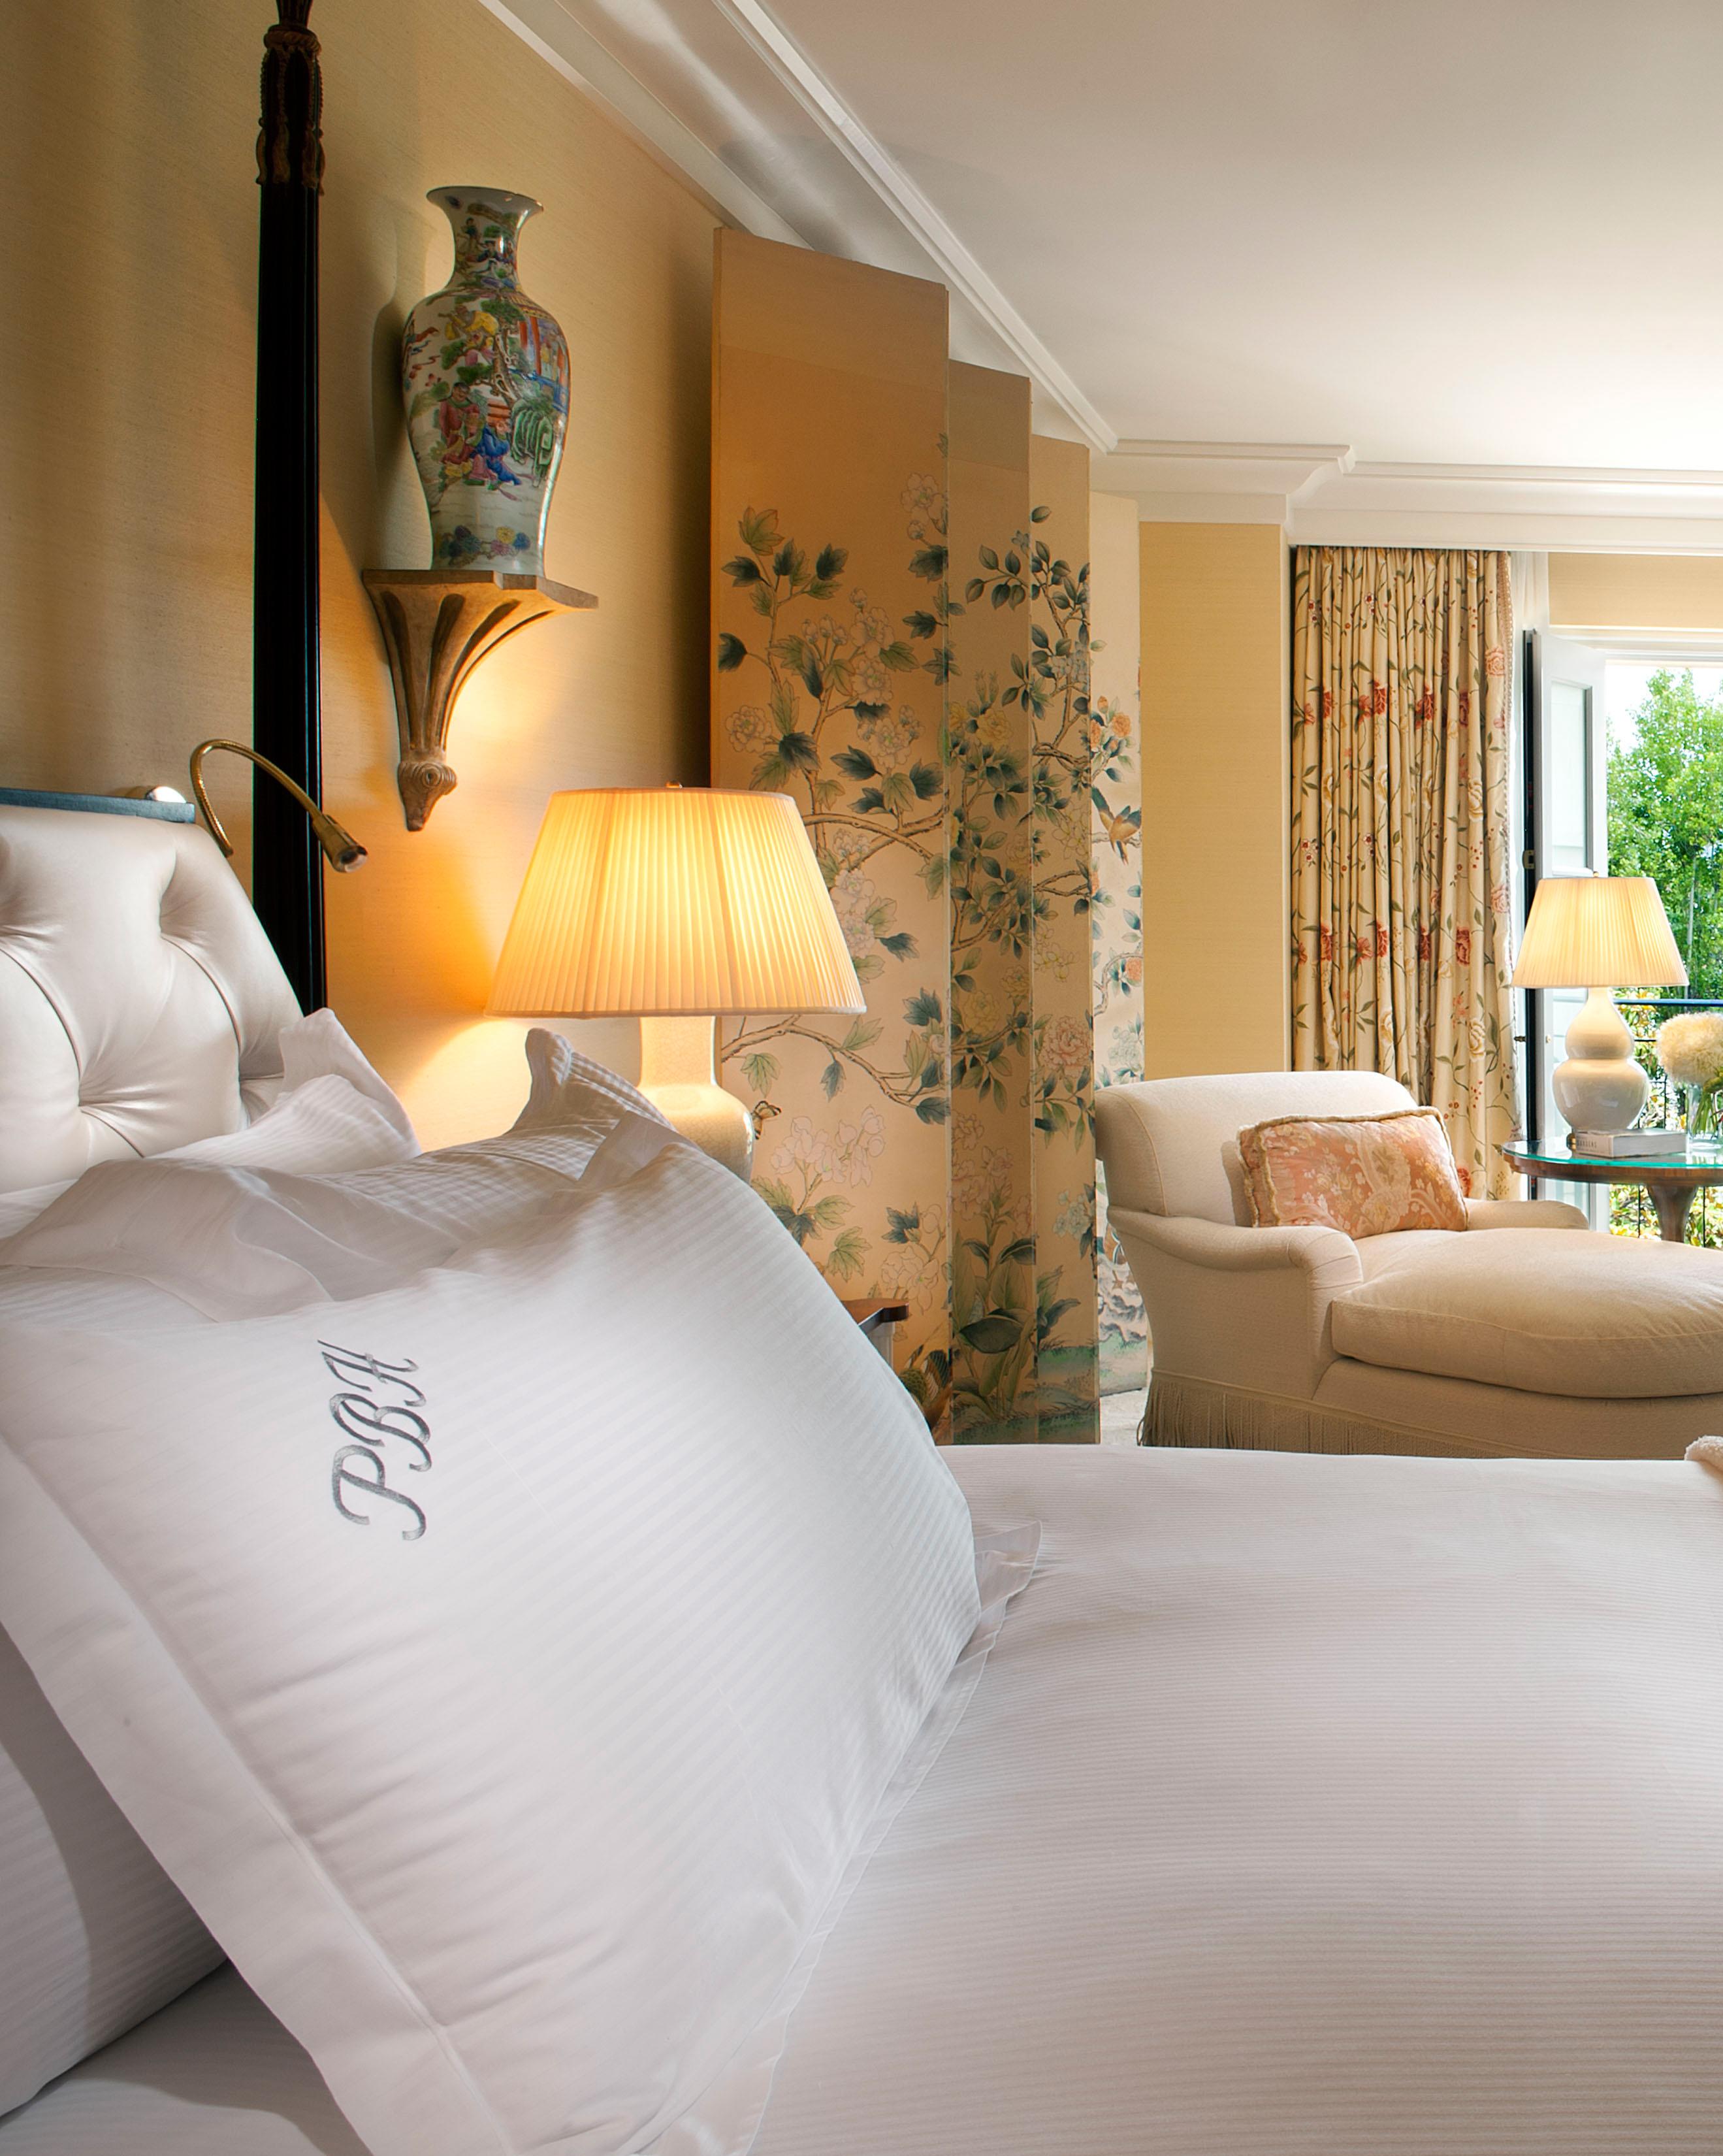 hotel-amenity-peninsula-monogram-0915.jpg